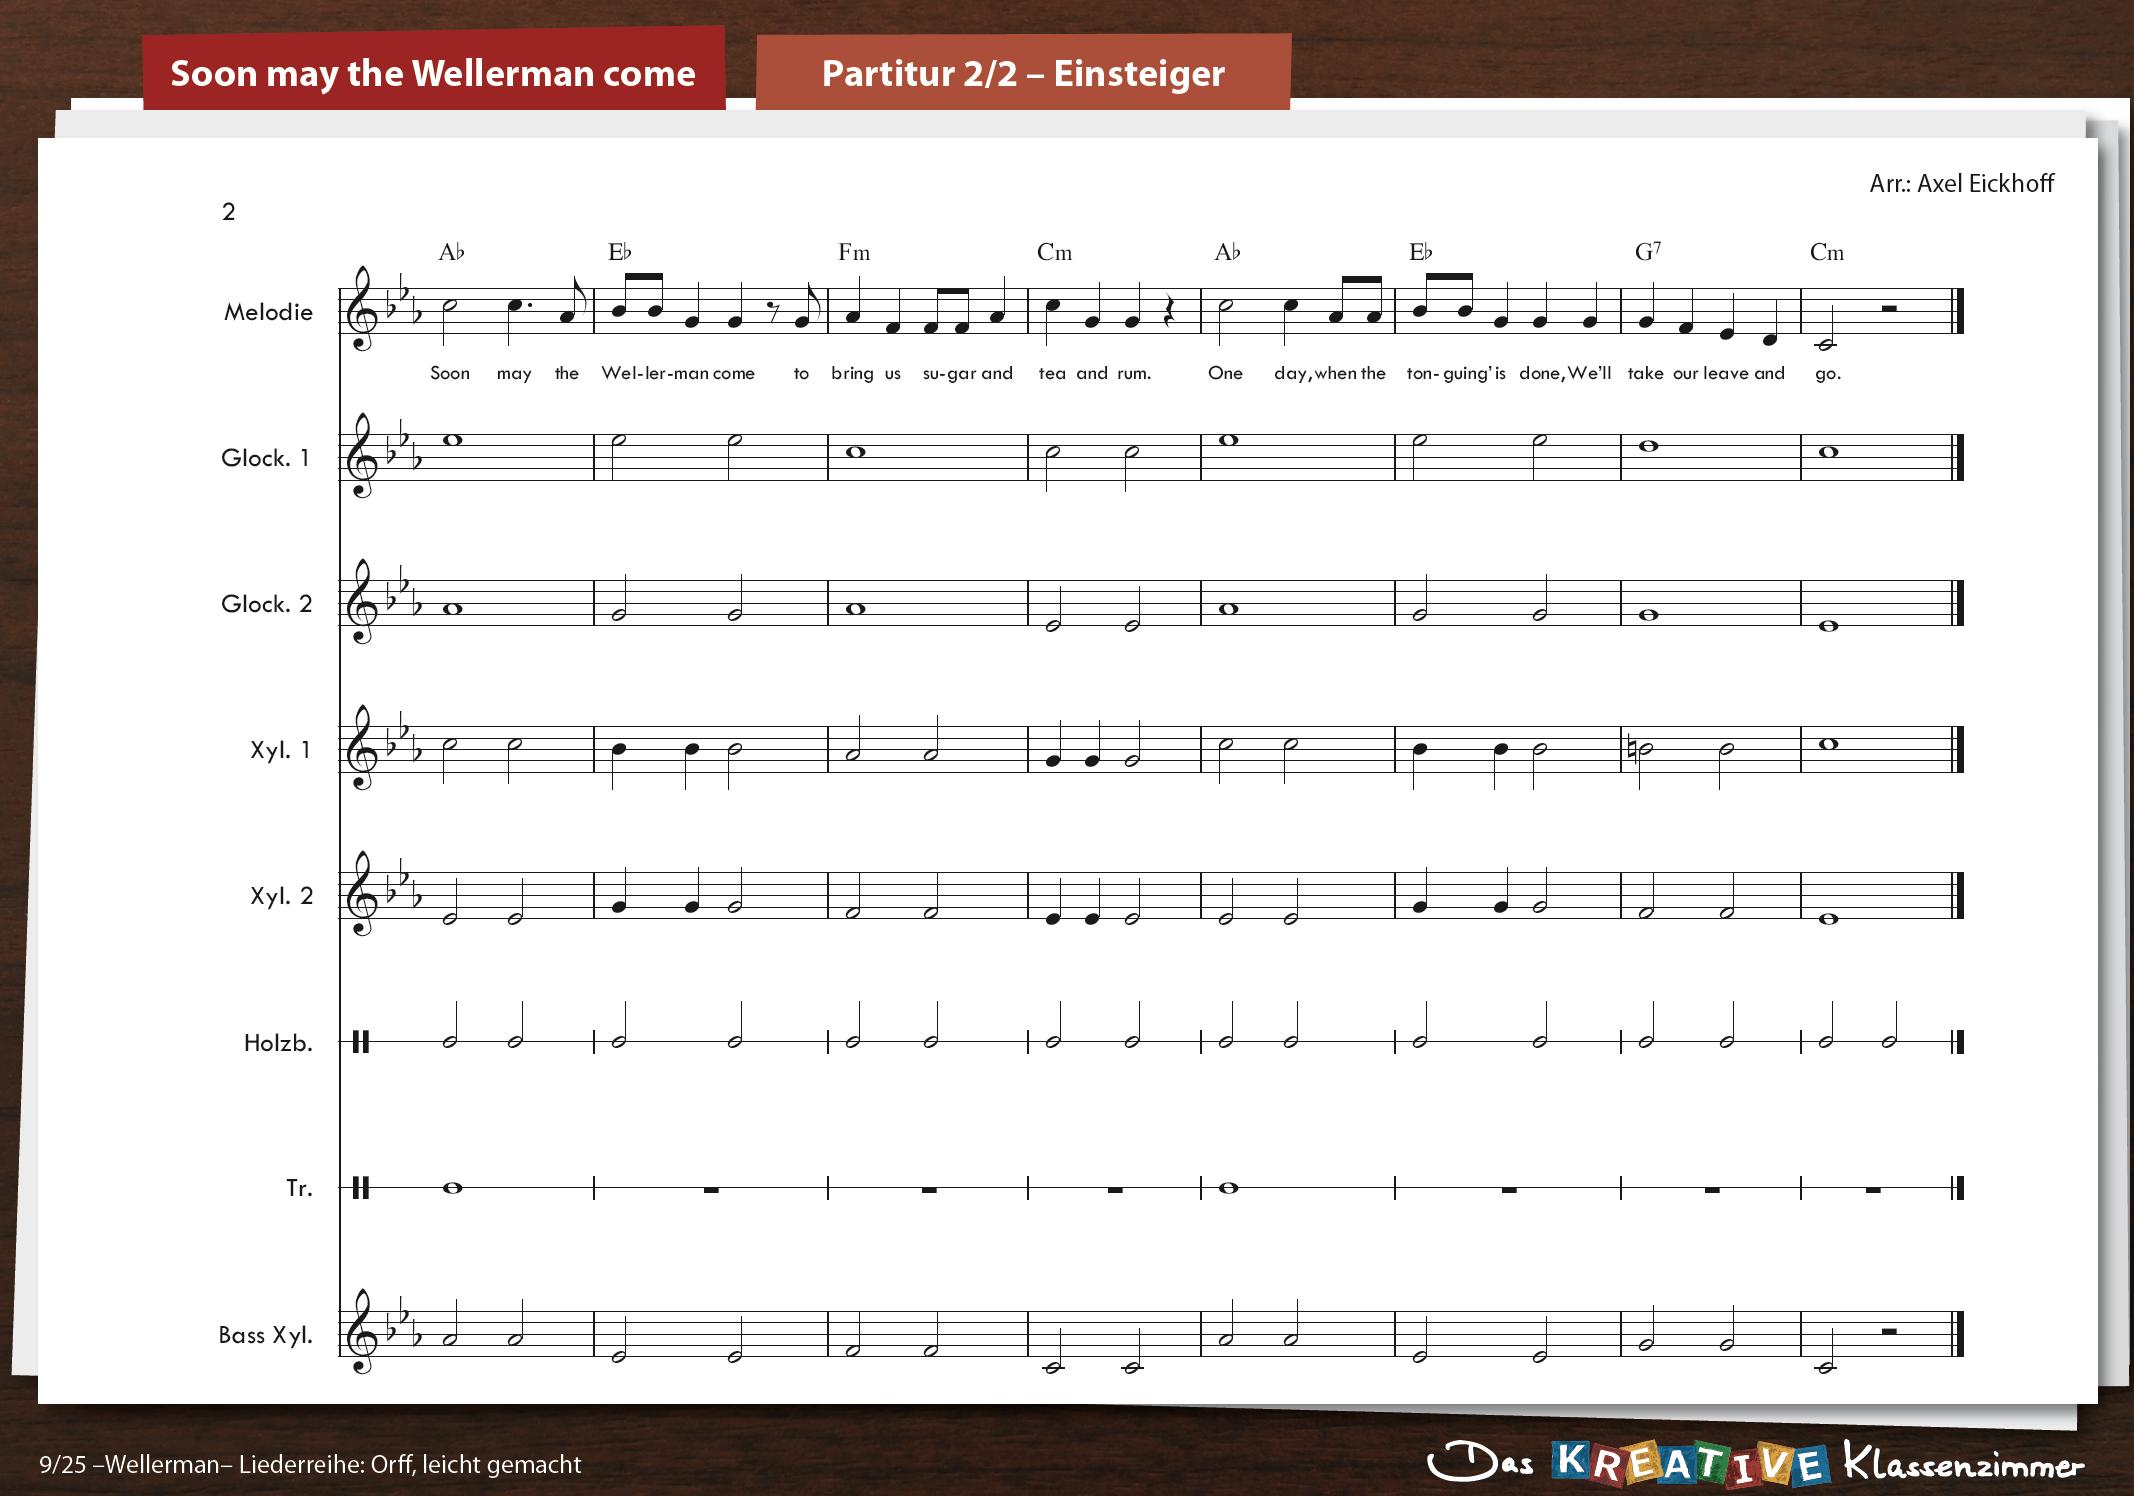 Wellerman (Soon may the Wellerman come) - Orff